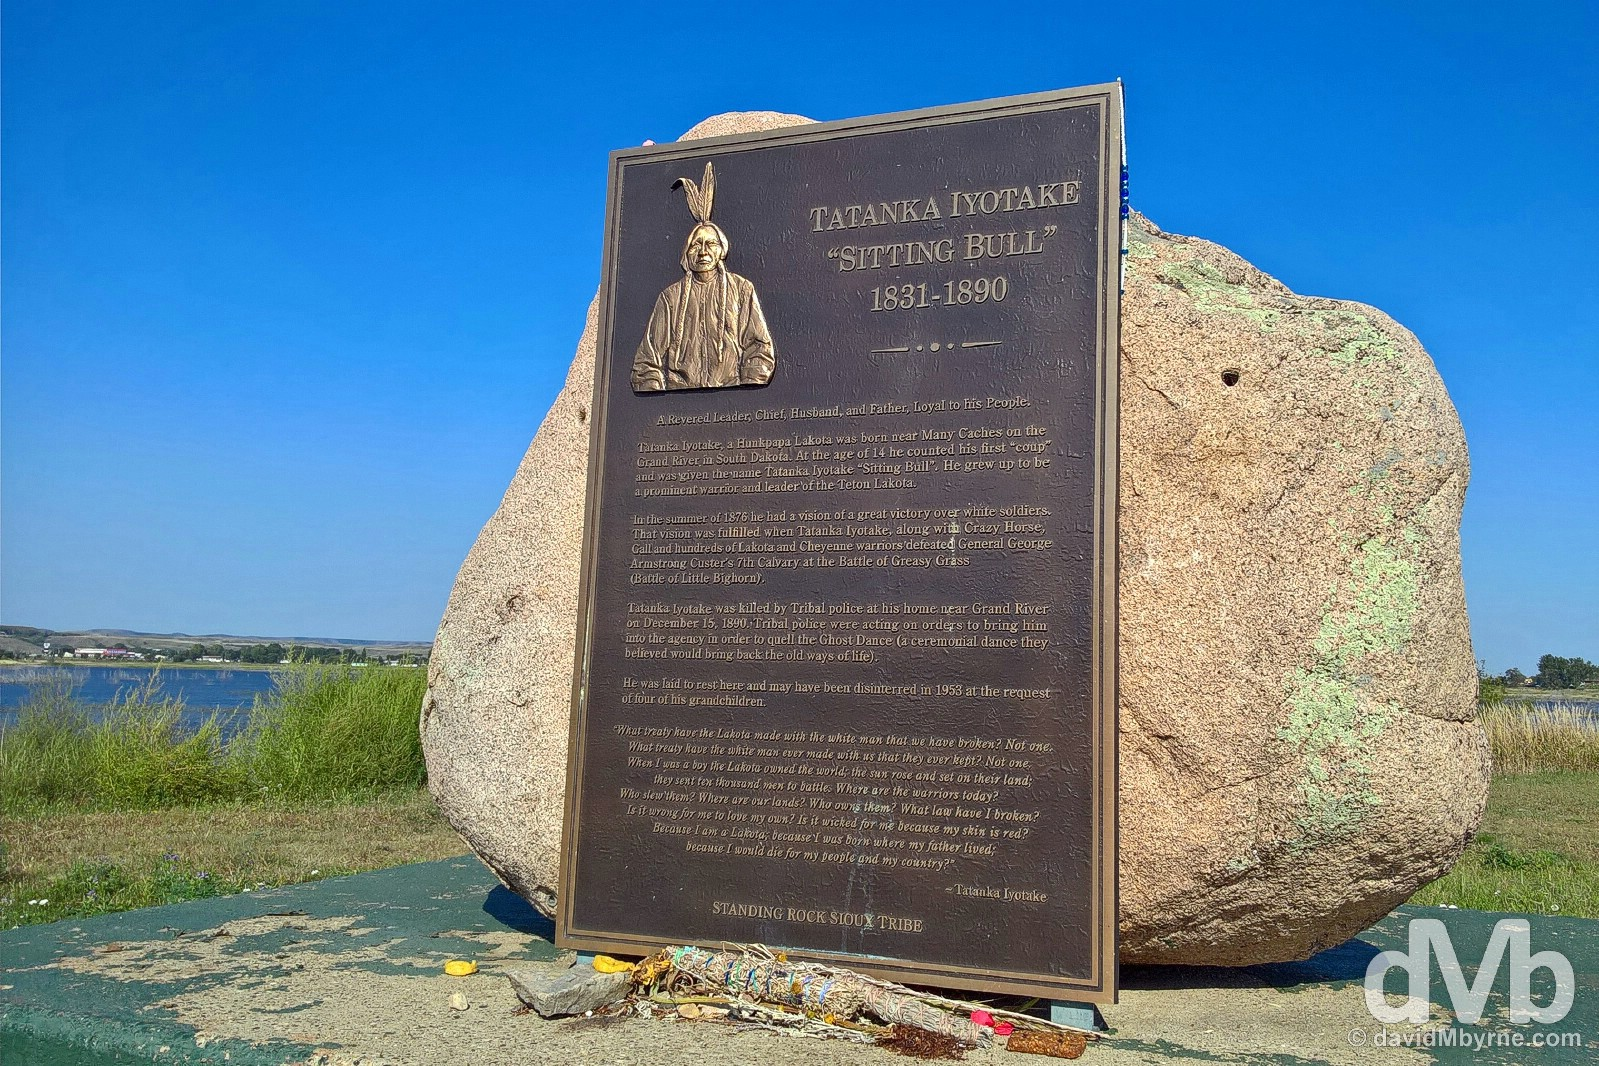 Sitting Bull Memorial by the Missouri River in Fort Yates, North Dakota. September 1, 2016.